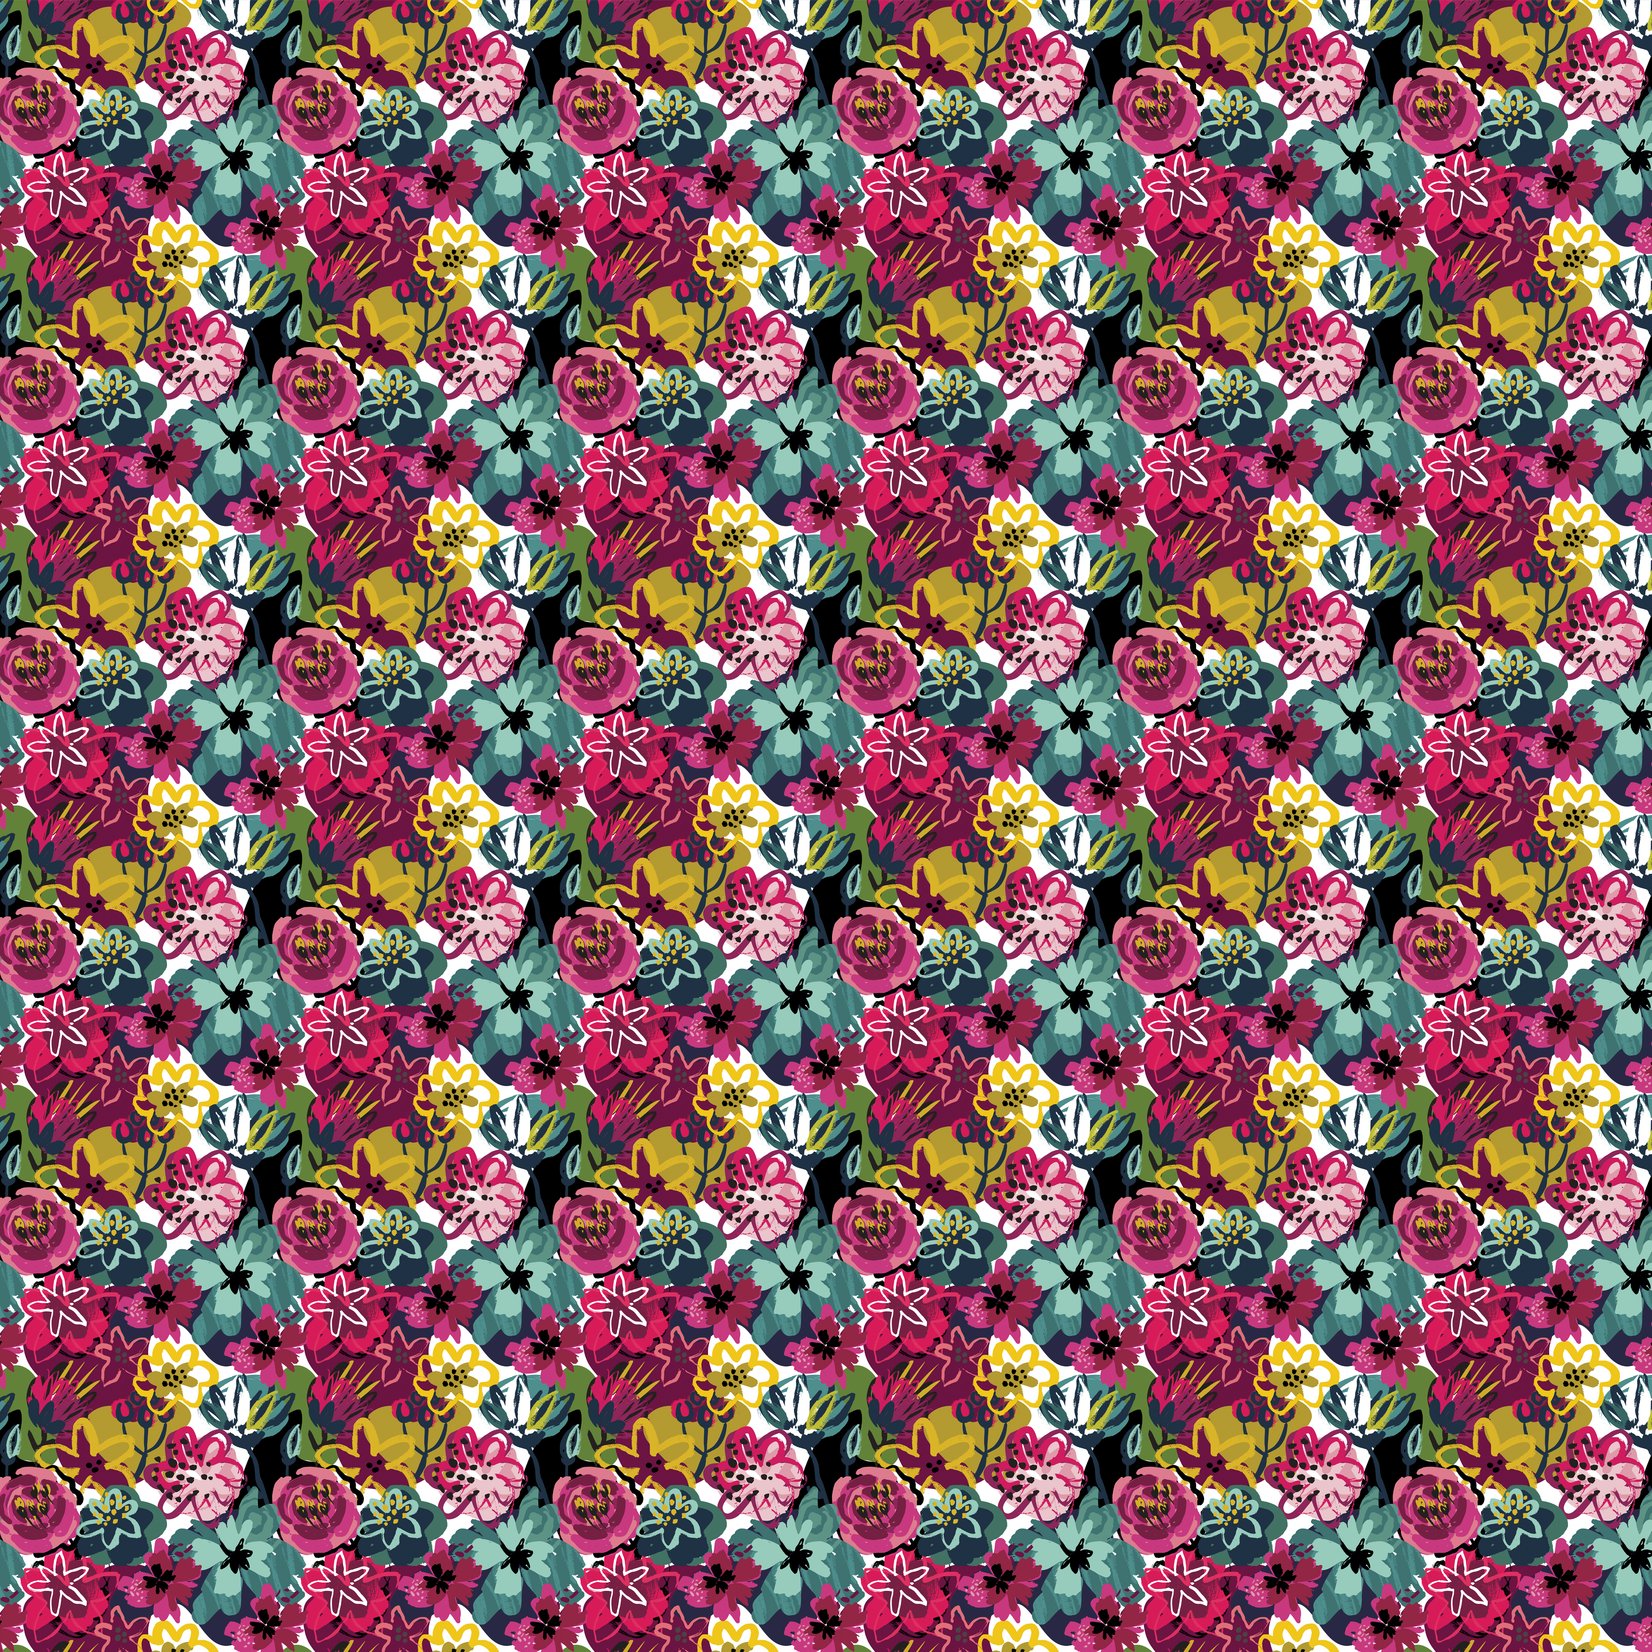 TVD Spring Flowerbed